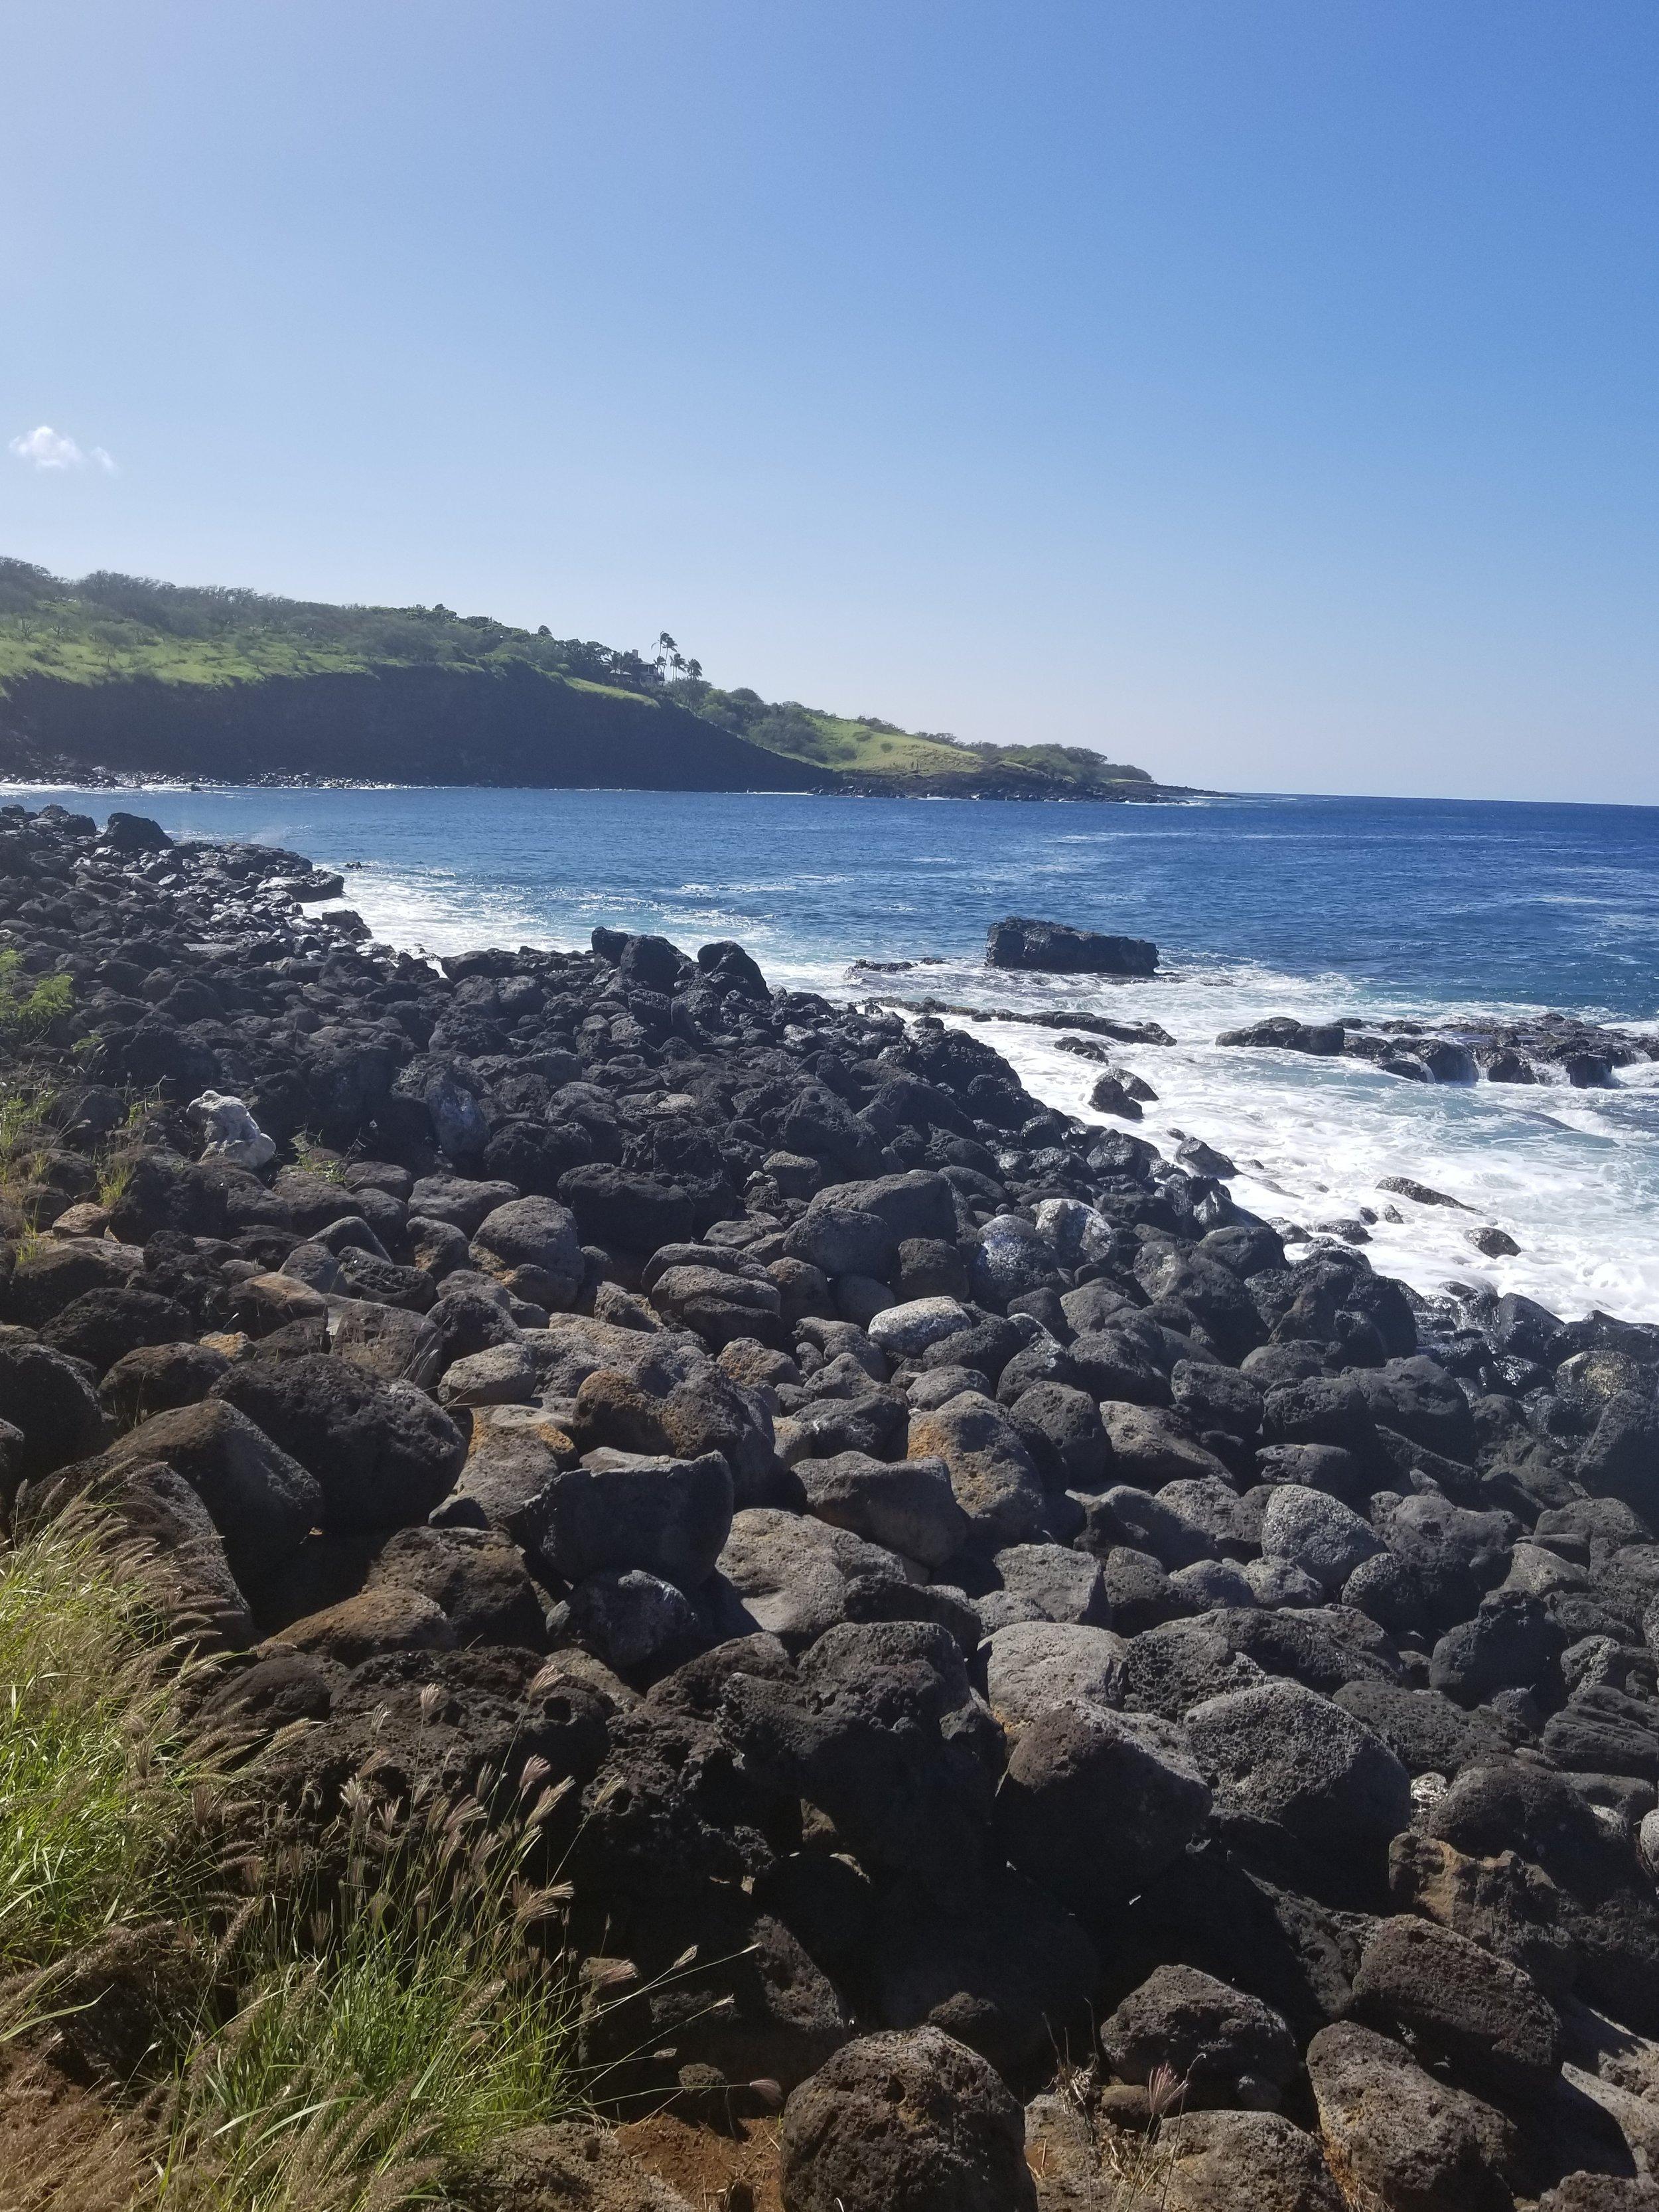 North Kohala Coastline, Hawaii Island